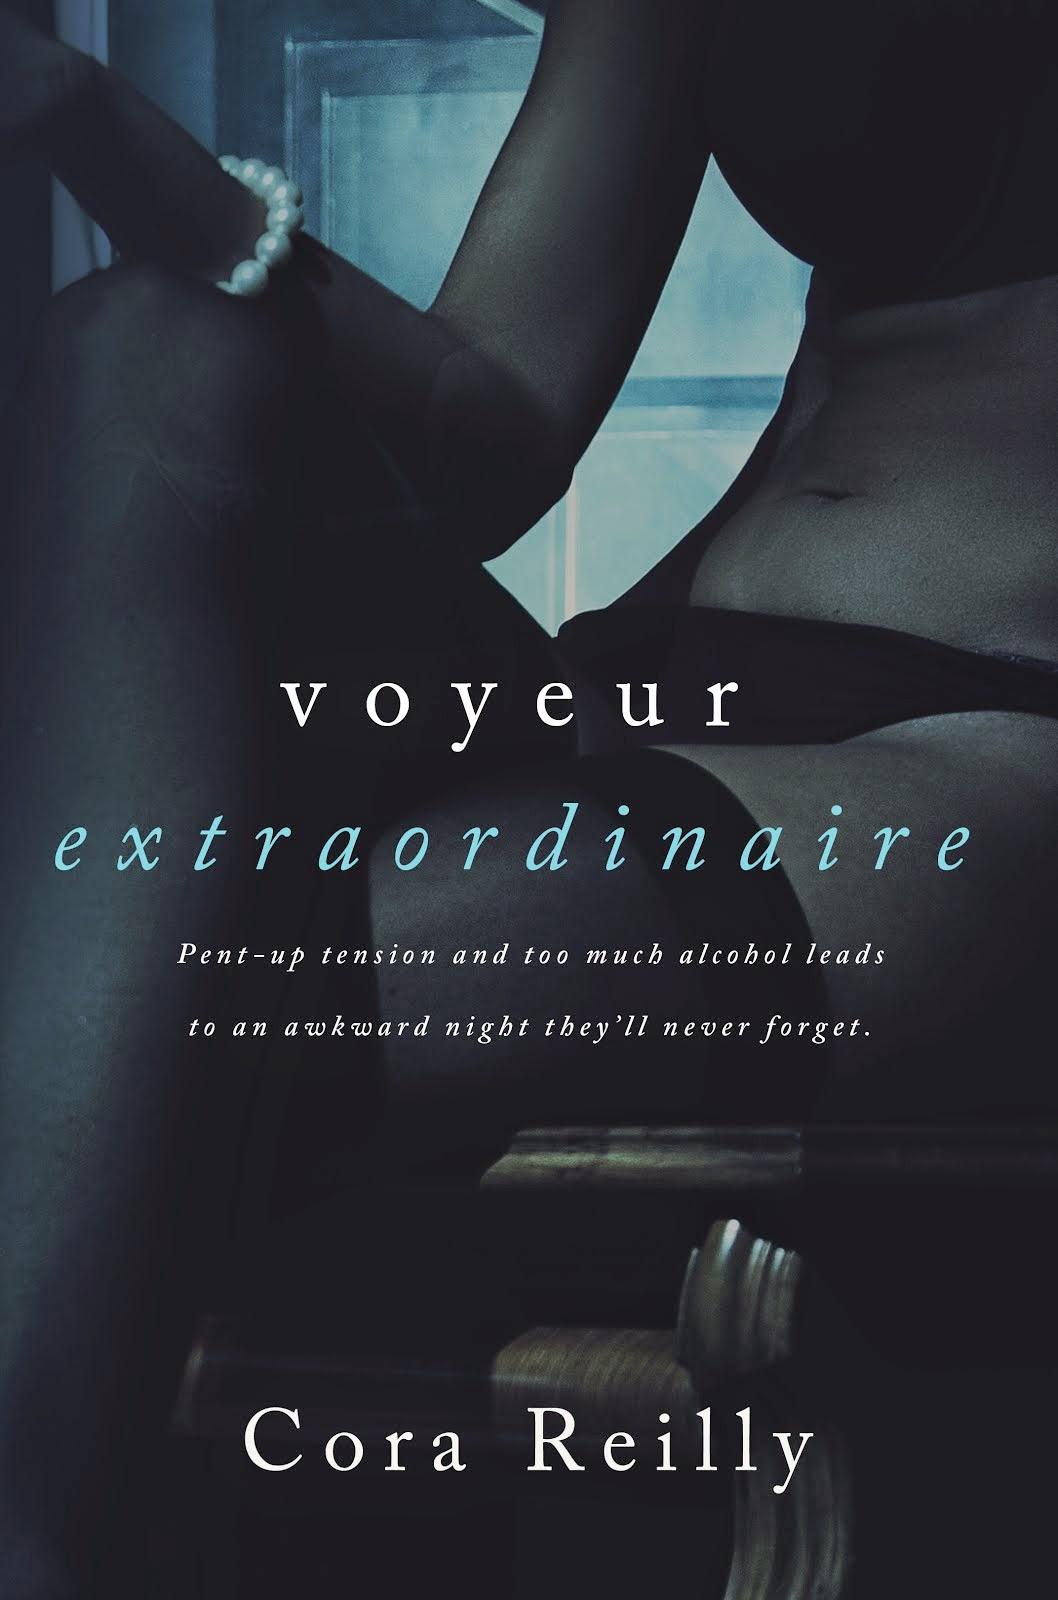 Buy Voyeur Extraordinaire!